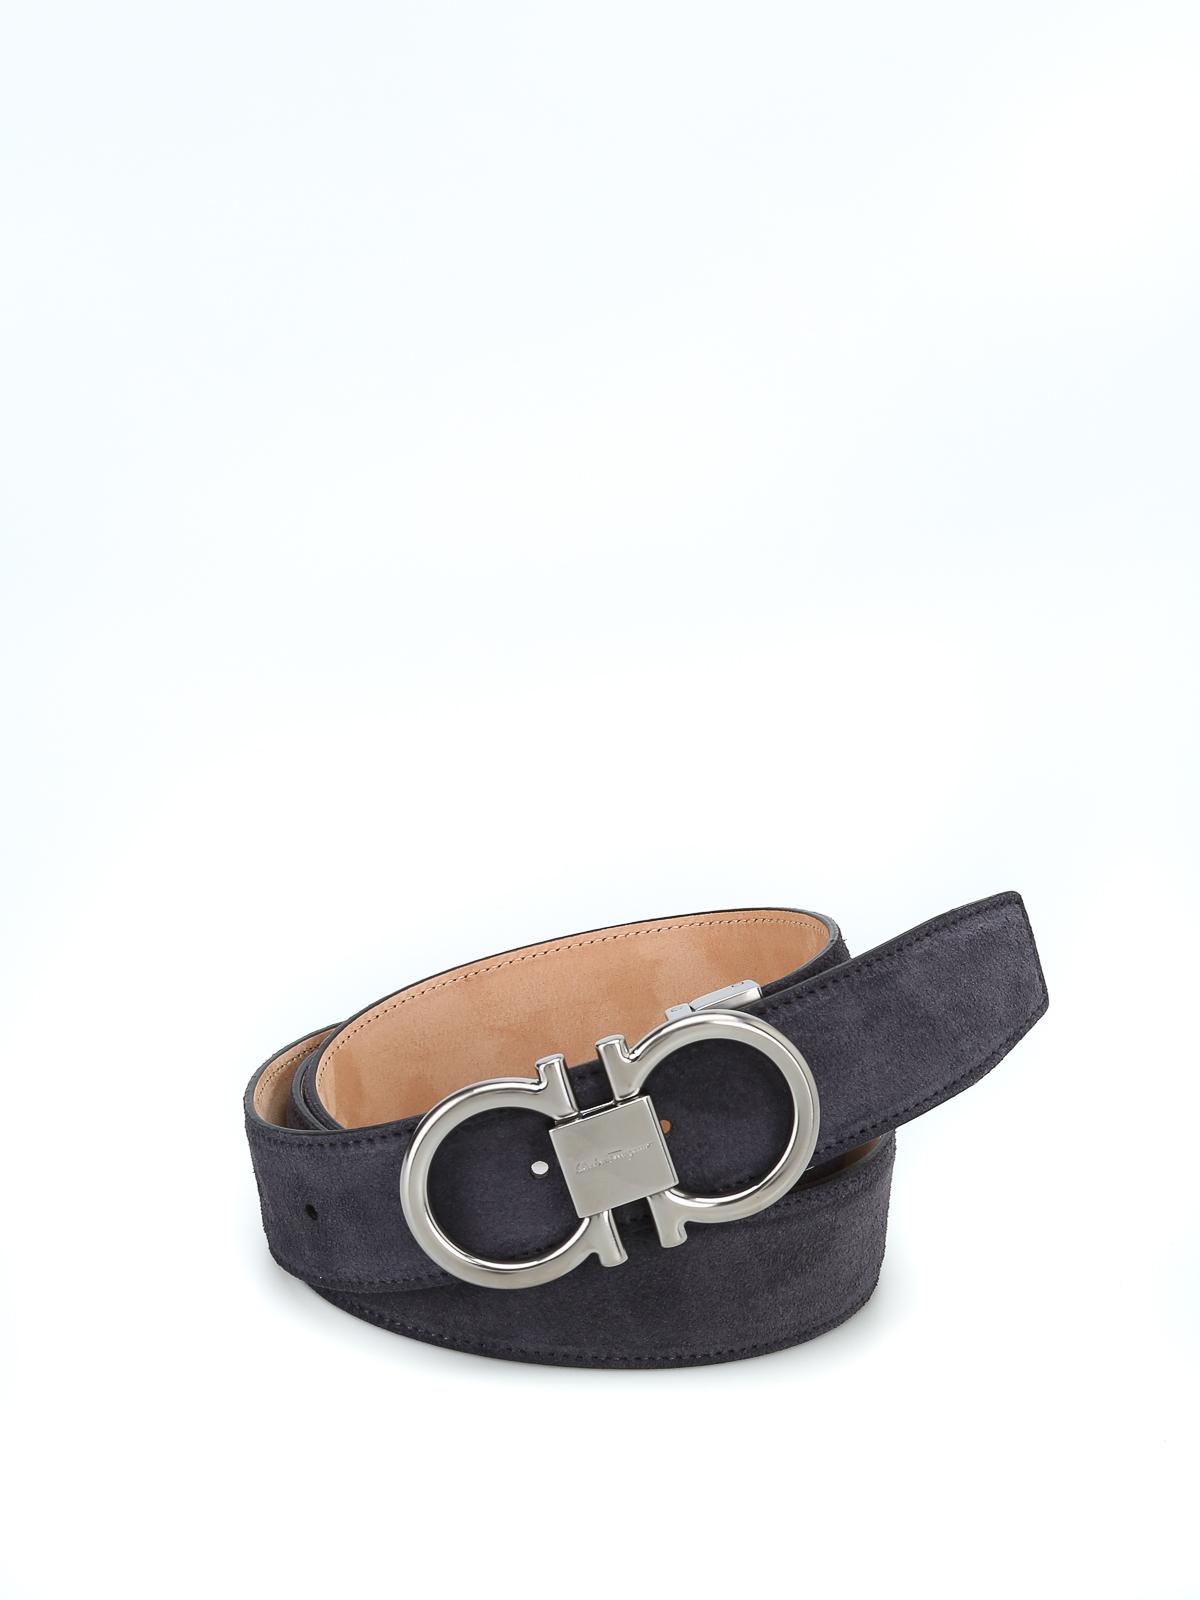 3ba27e47a4 SALVATORE FERRAGAMO: cinture - Cintura in suede con fibbia argento Gancini